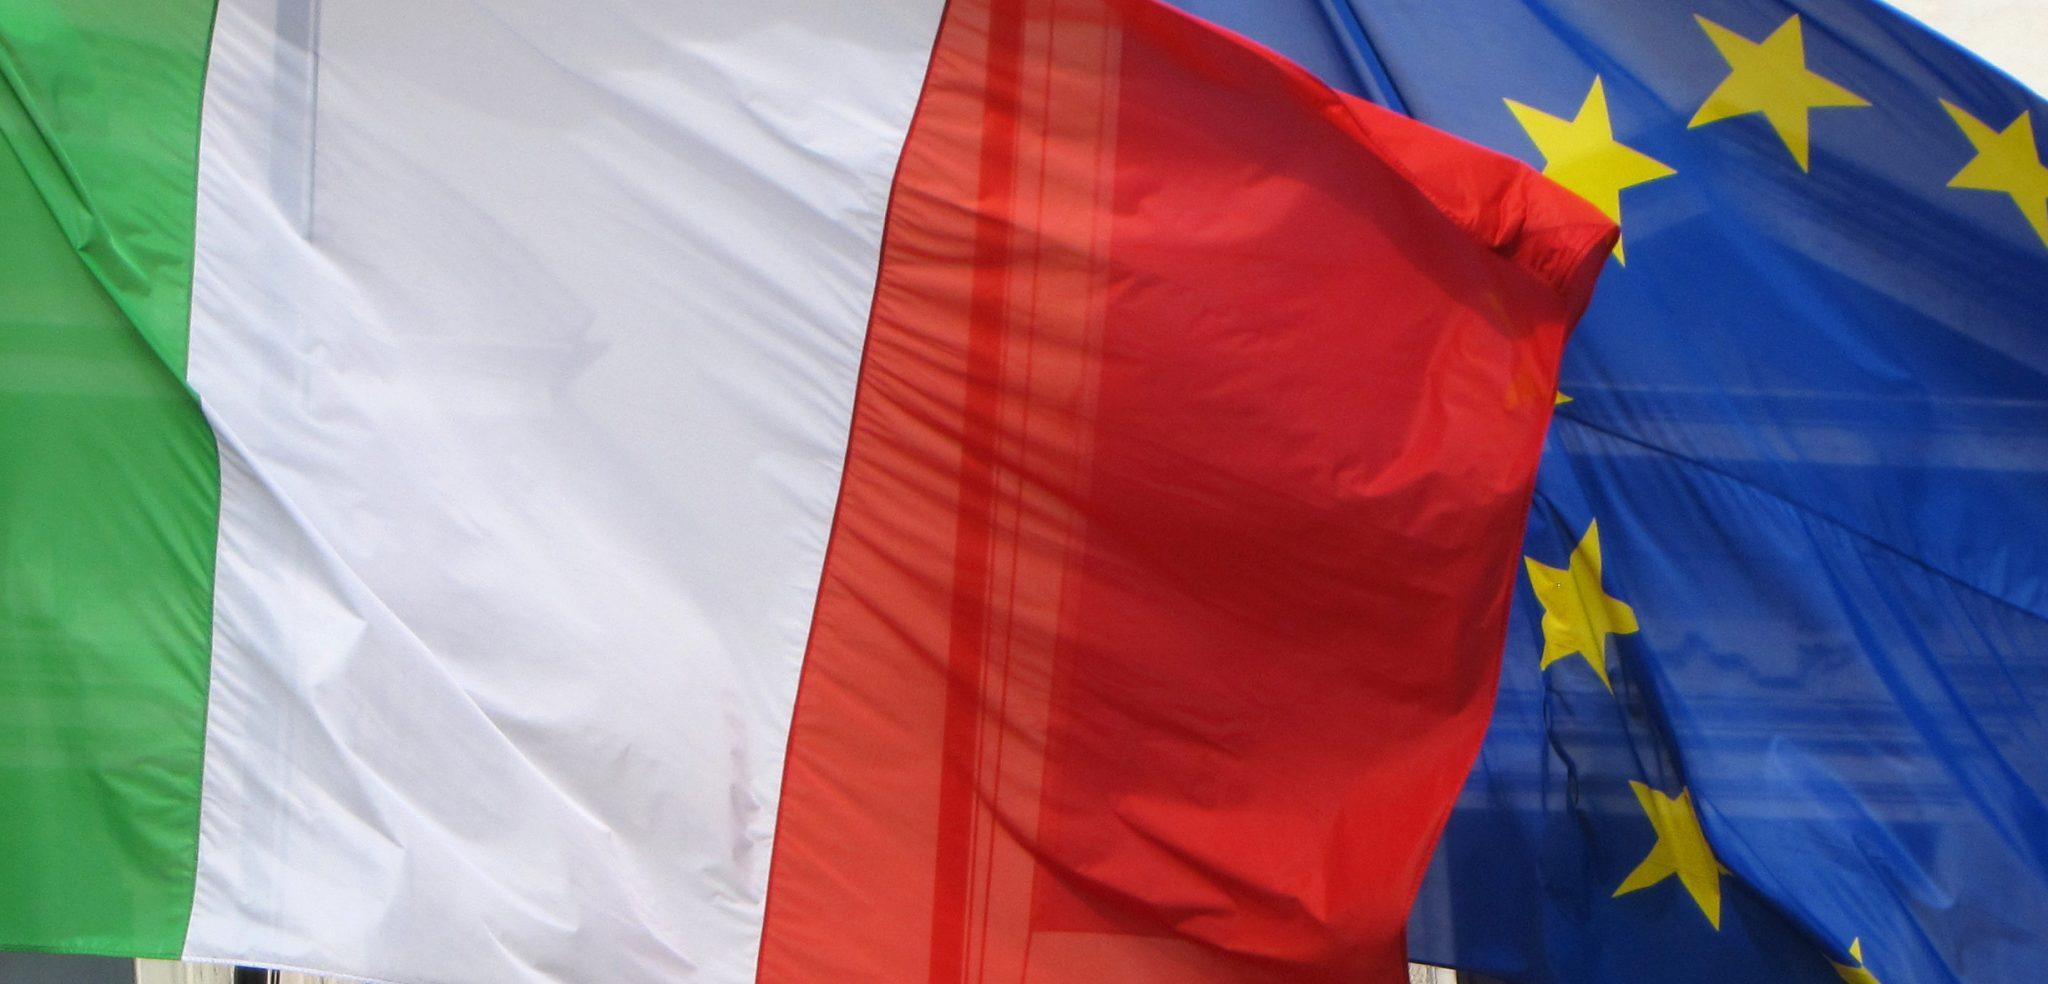 ItalyEUflag, cc Flickr Ed Uthman, modified,